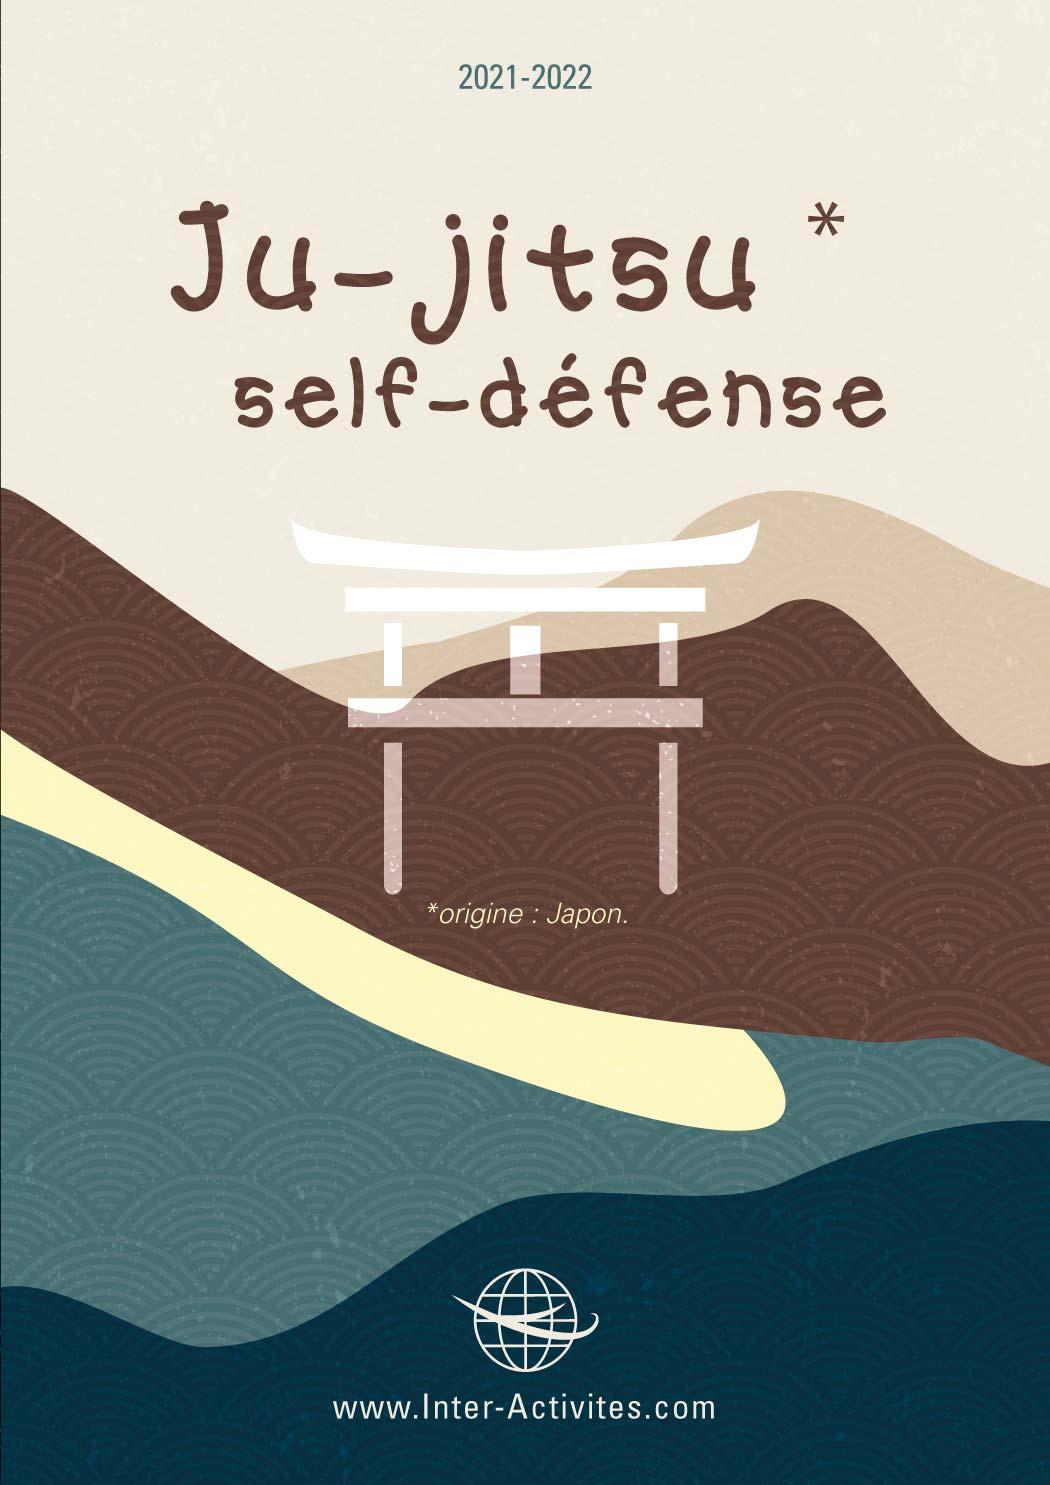 Ju-jitsu- Inter-Activités Sport Paris Centre